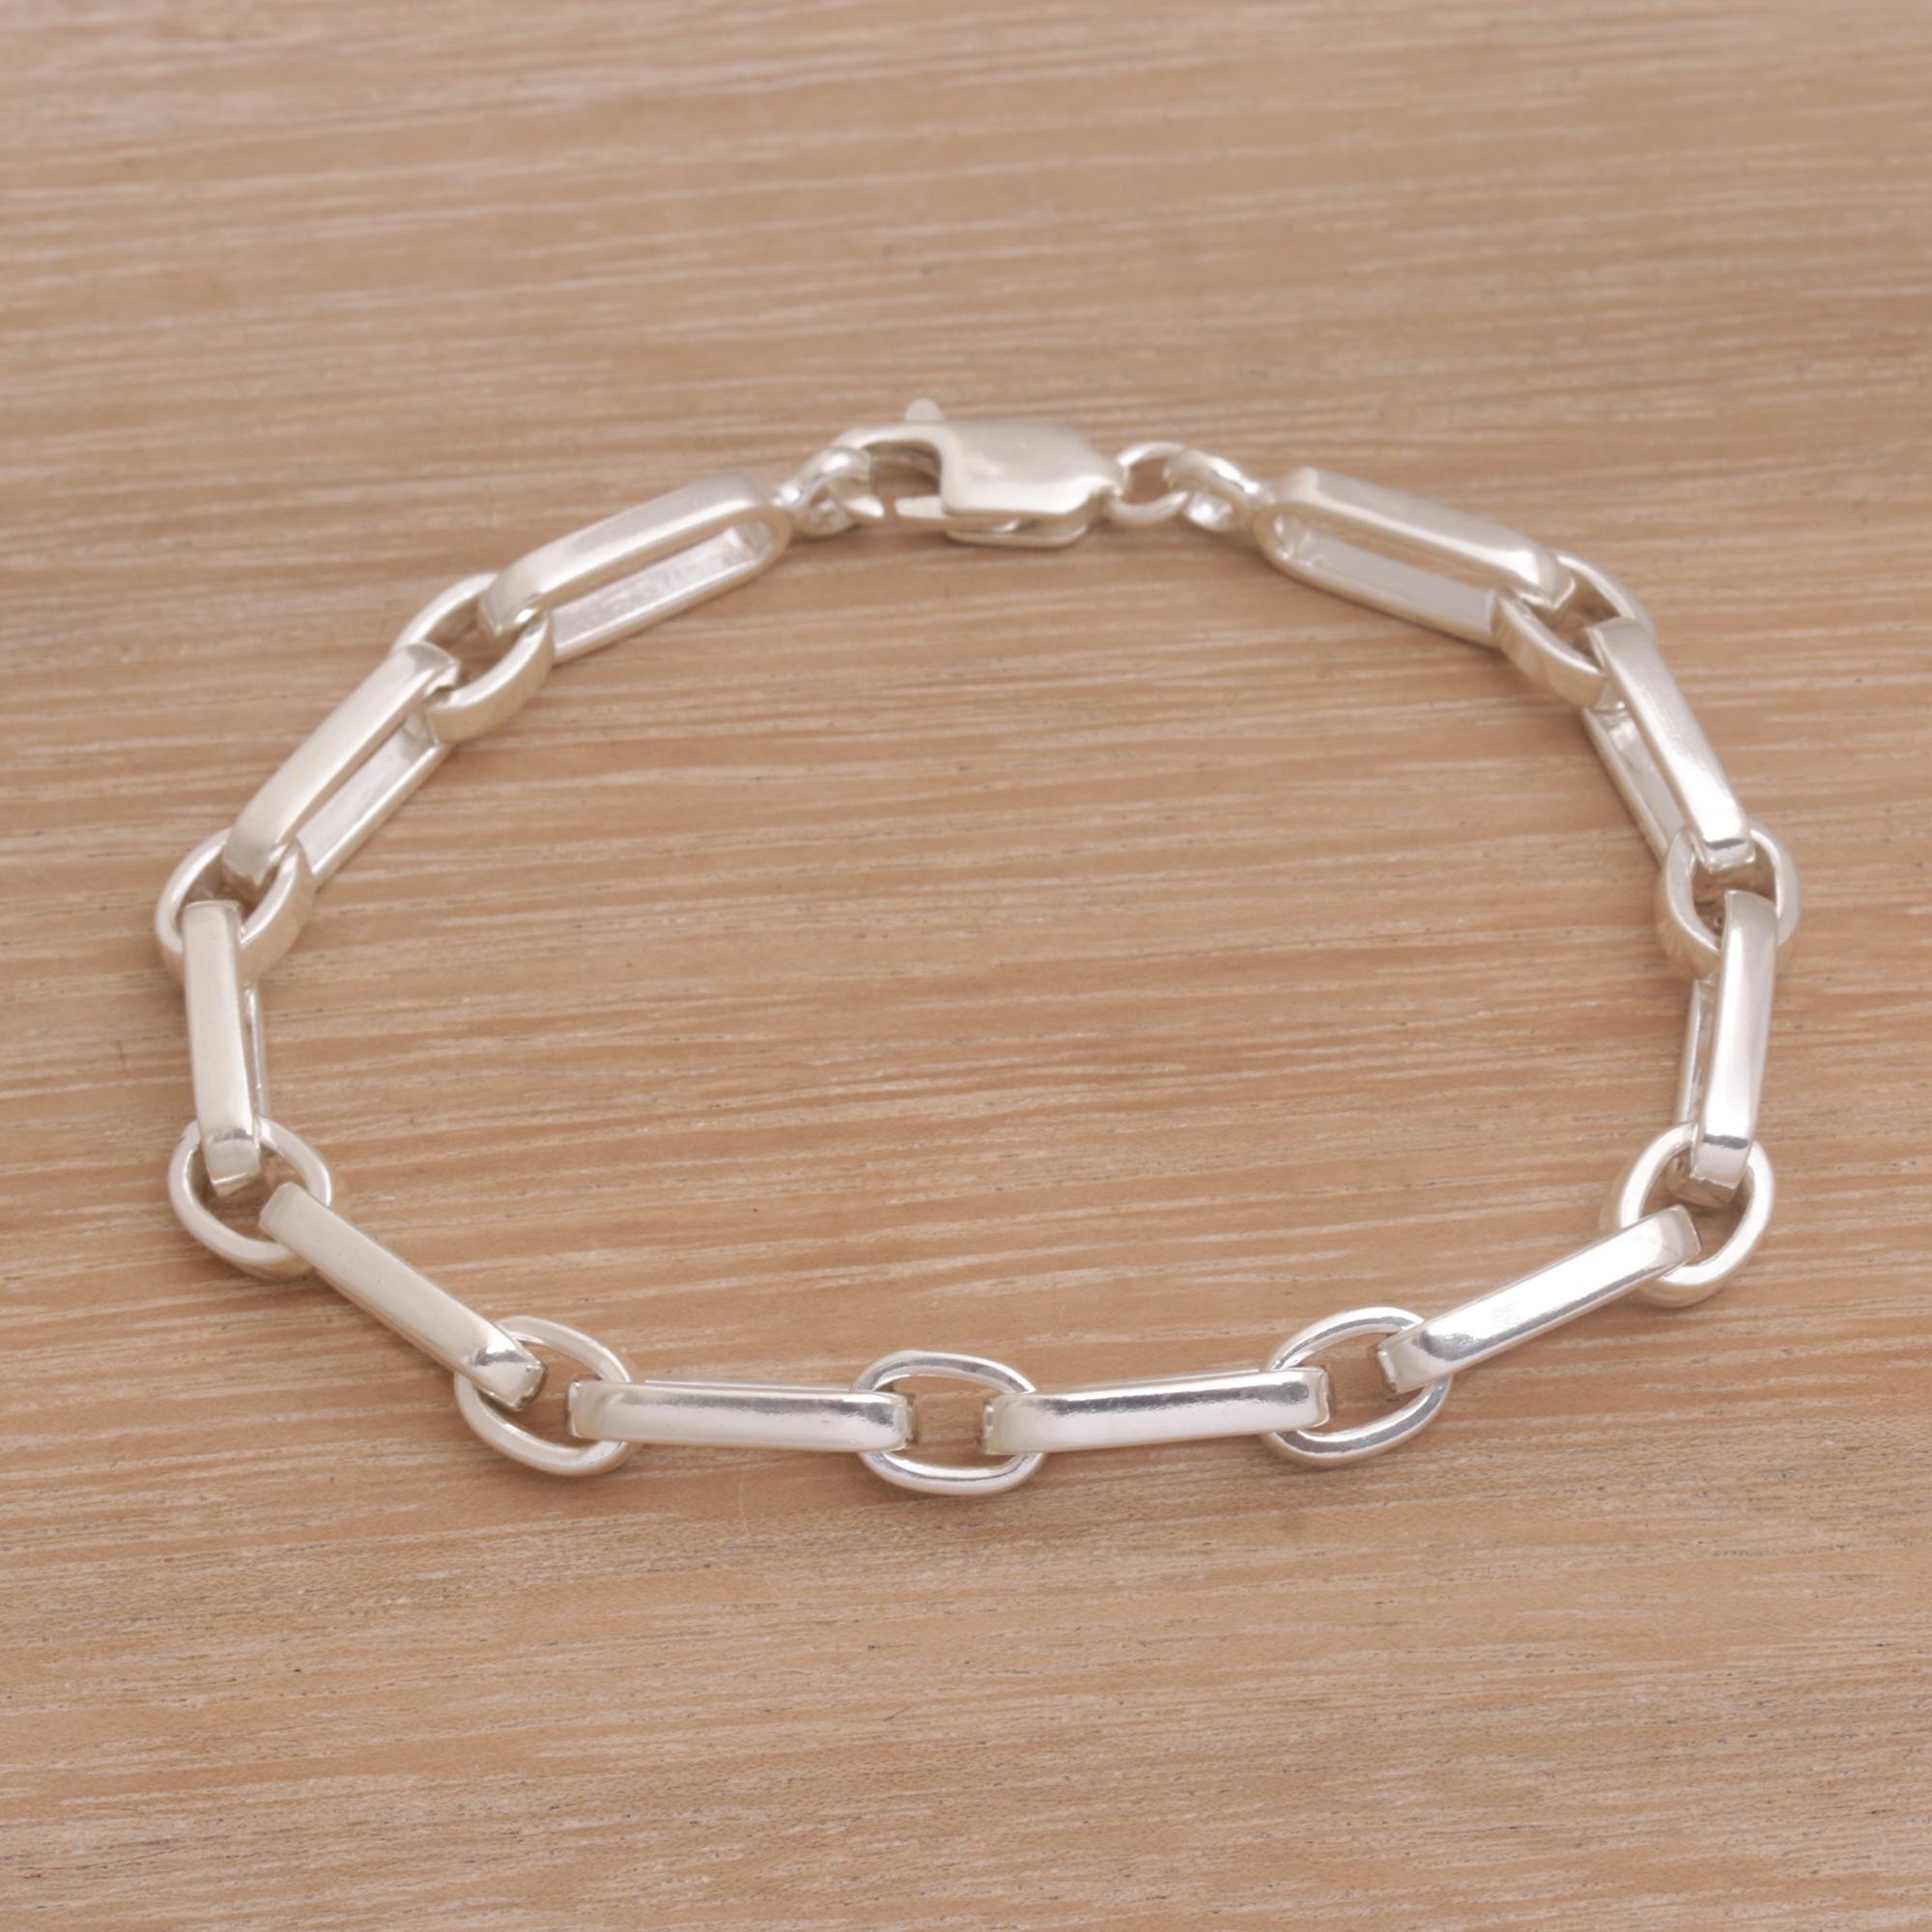 Handmade Sterling Silver Link Bracelet